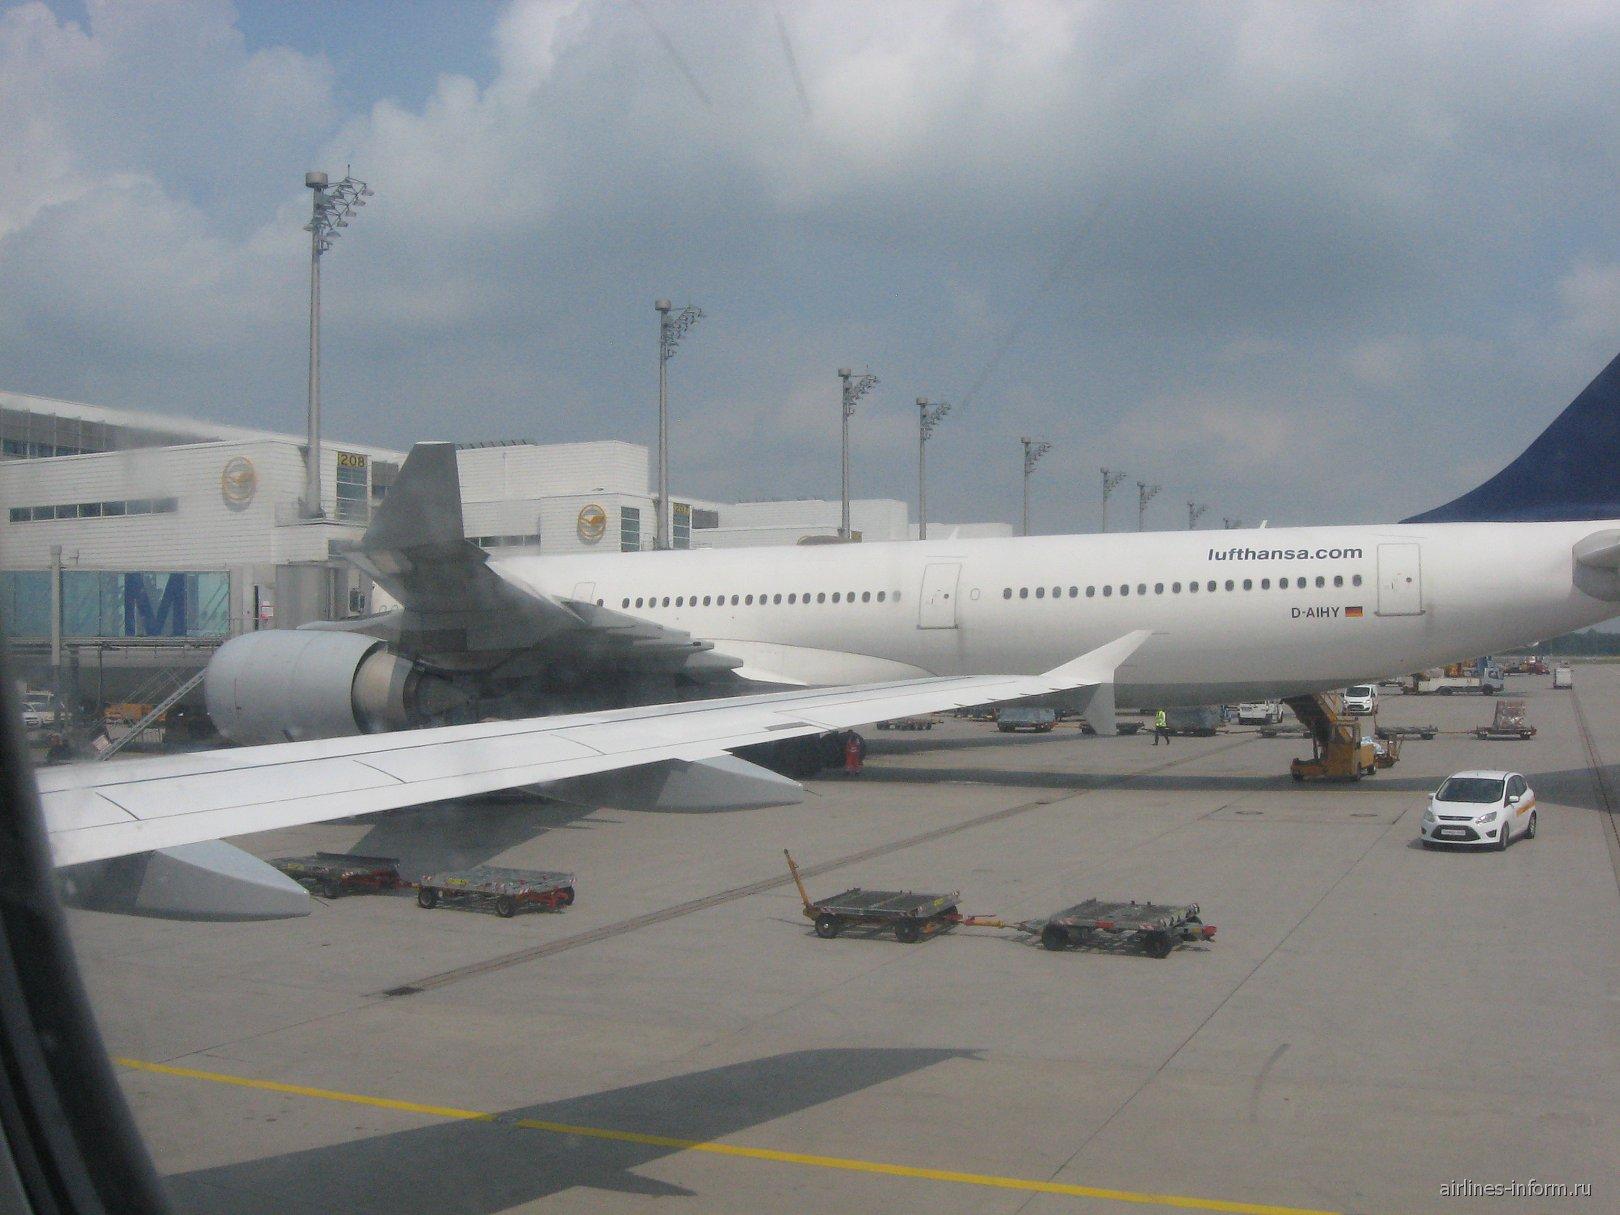 A340 Lufthansa